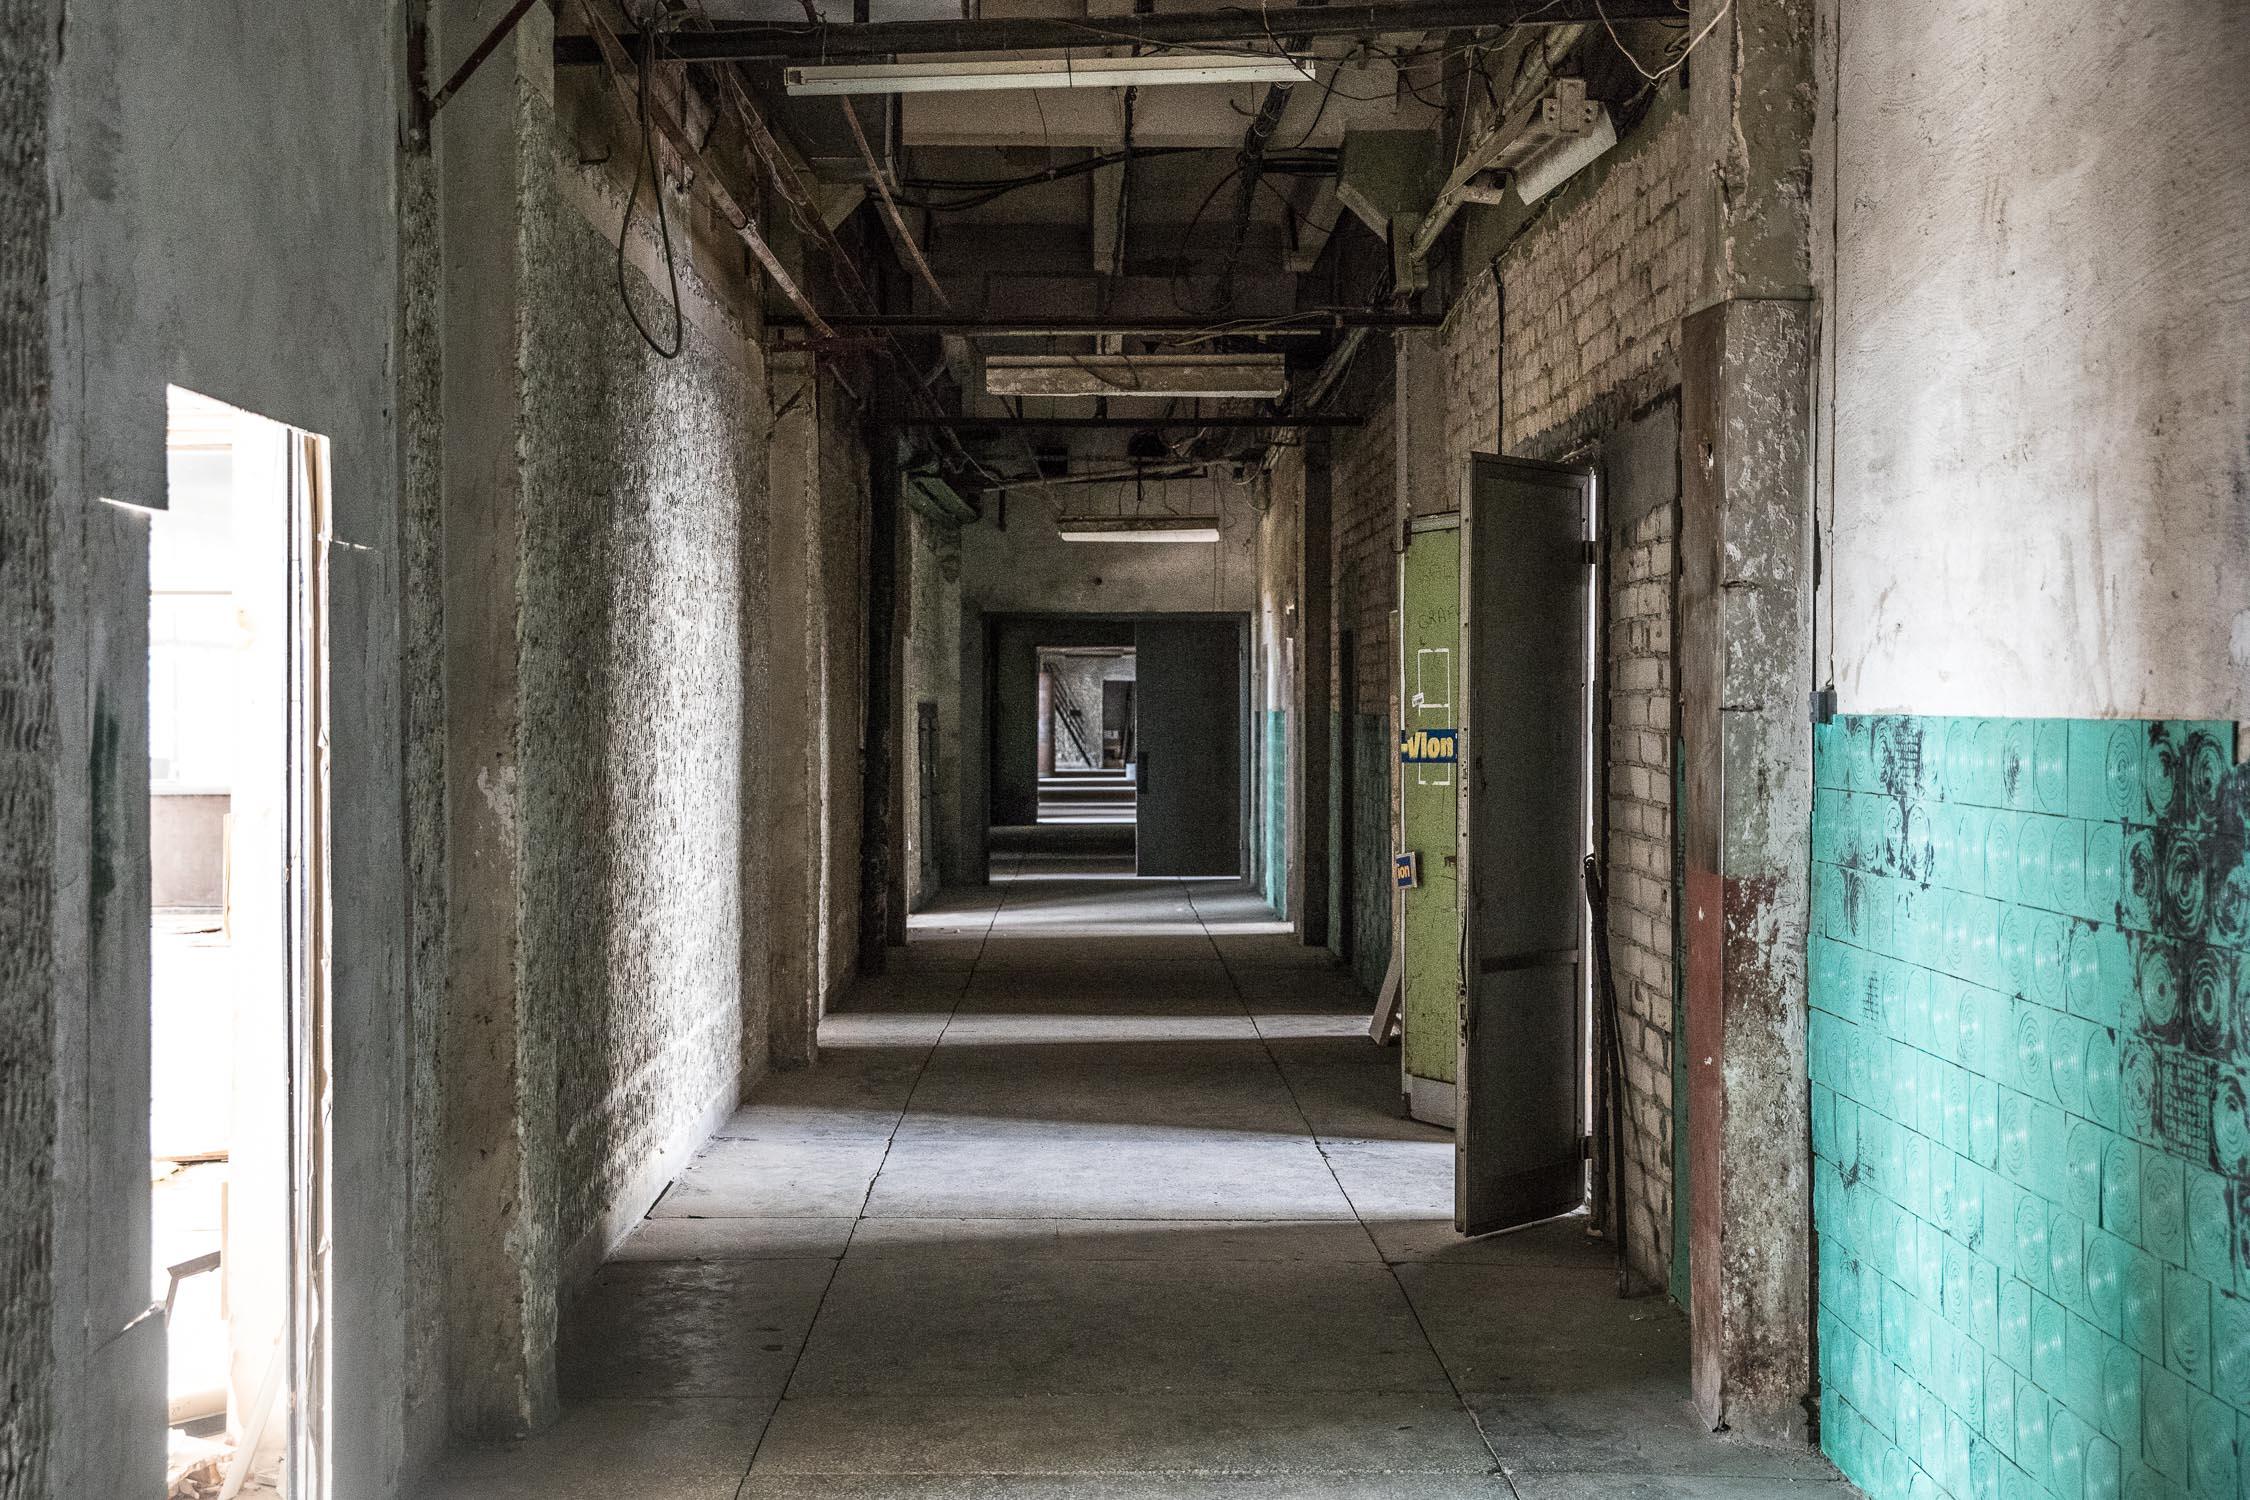 Chernobyl_Kaunas